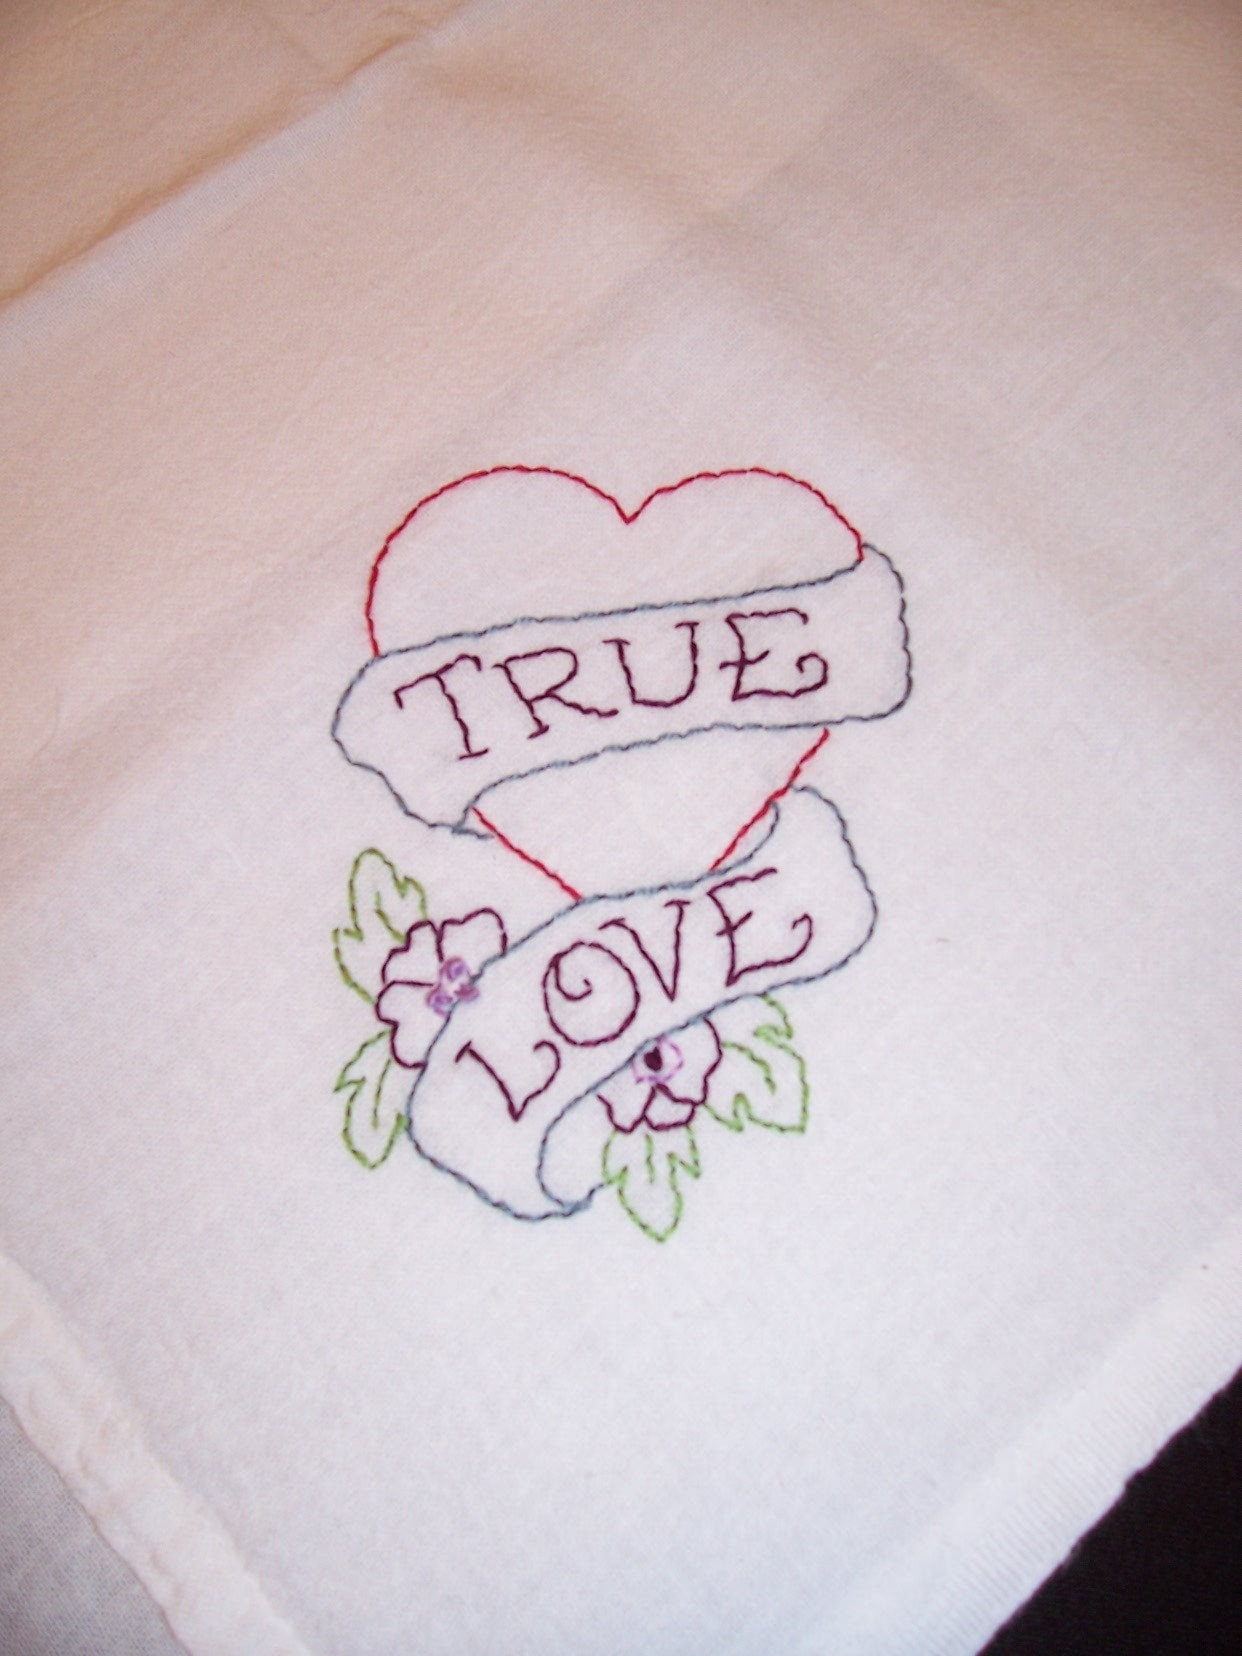 True Love tattoo design Hand